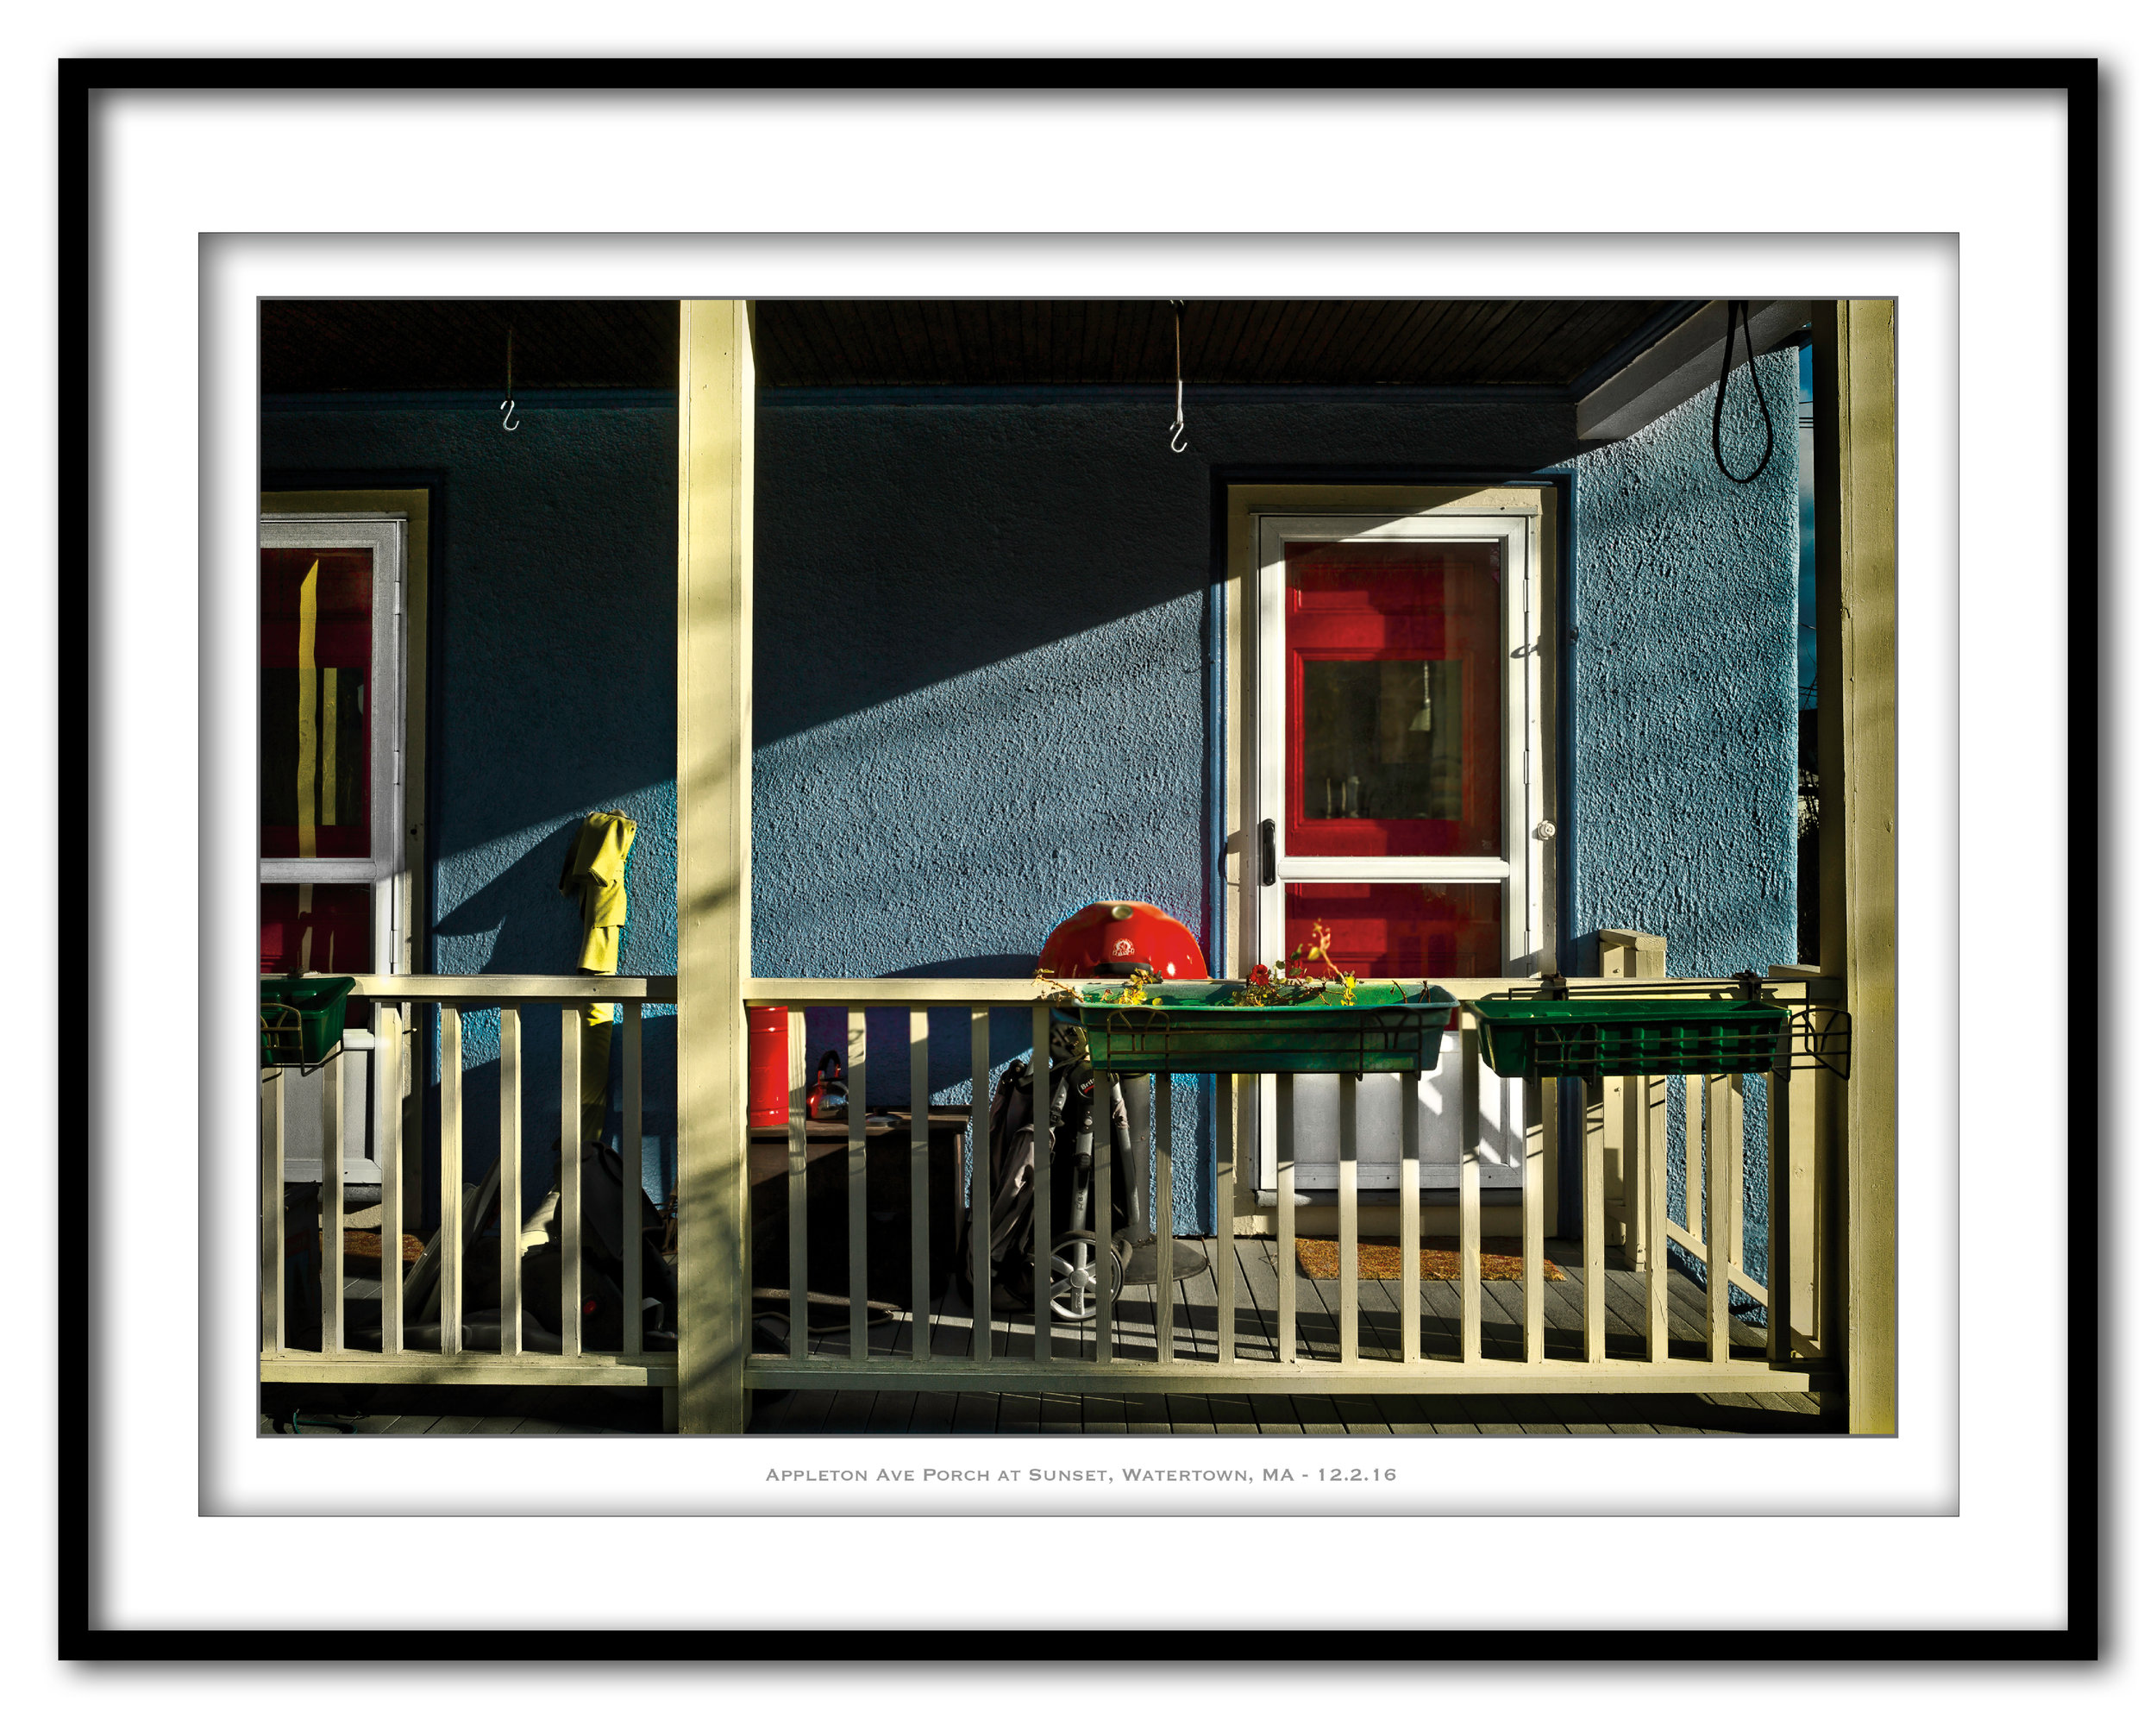 Appleton Ave Porch at Sunset, Watertown, MA - 12.2.16 - Framed.jpg